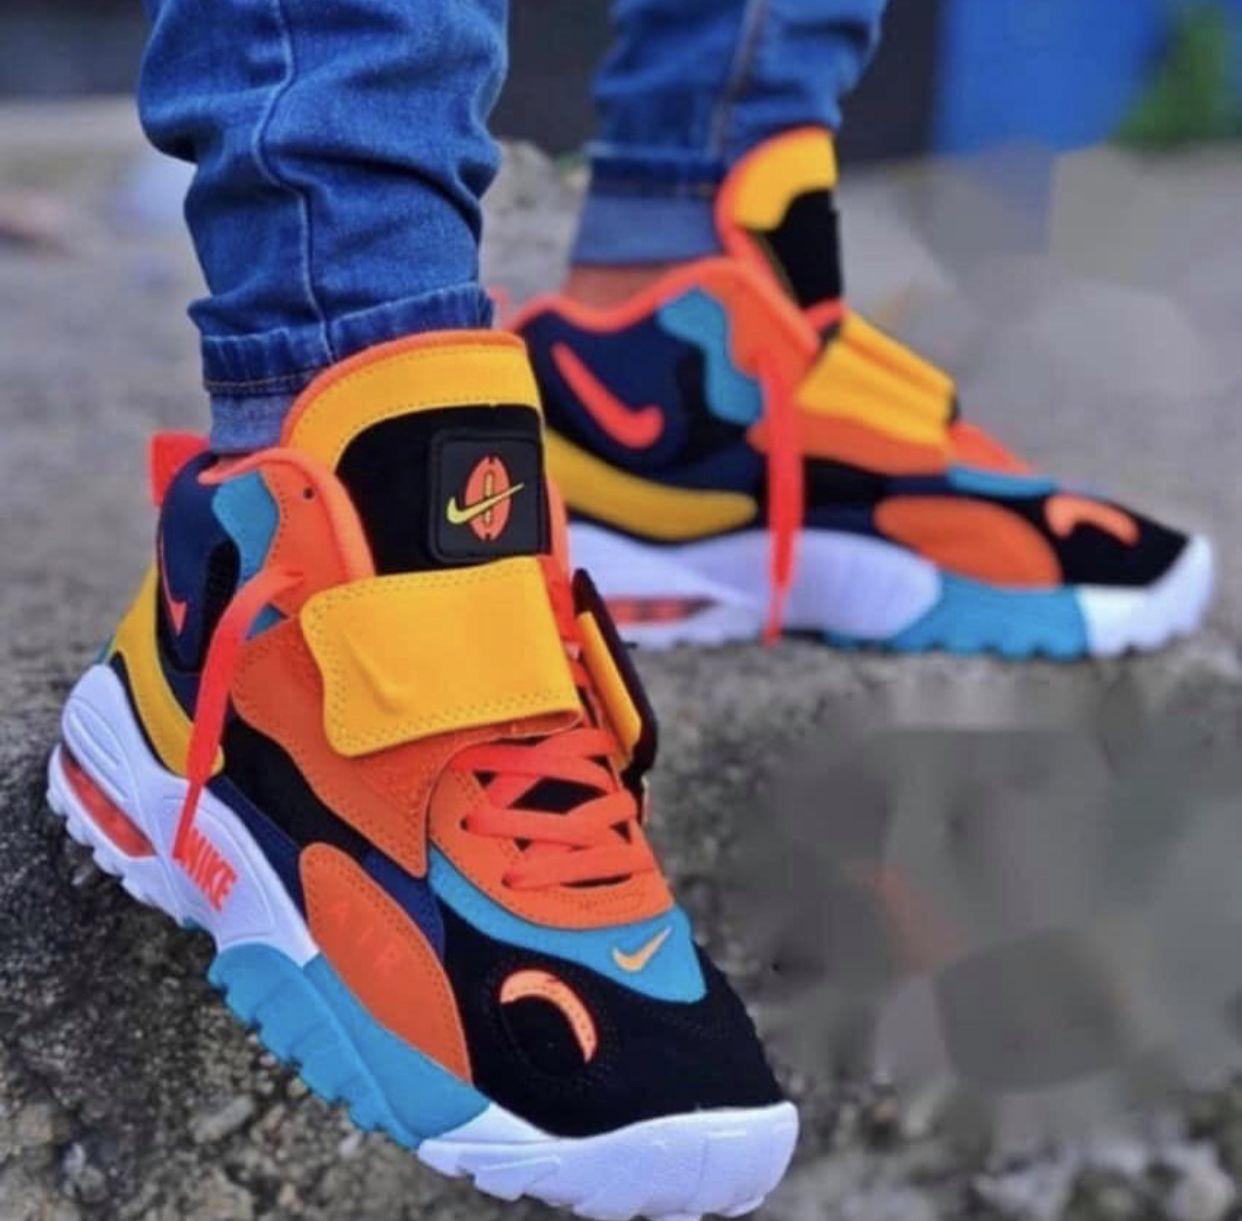 adidas sonic stivali uomo scarpe da ginnastica